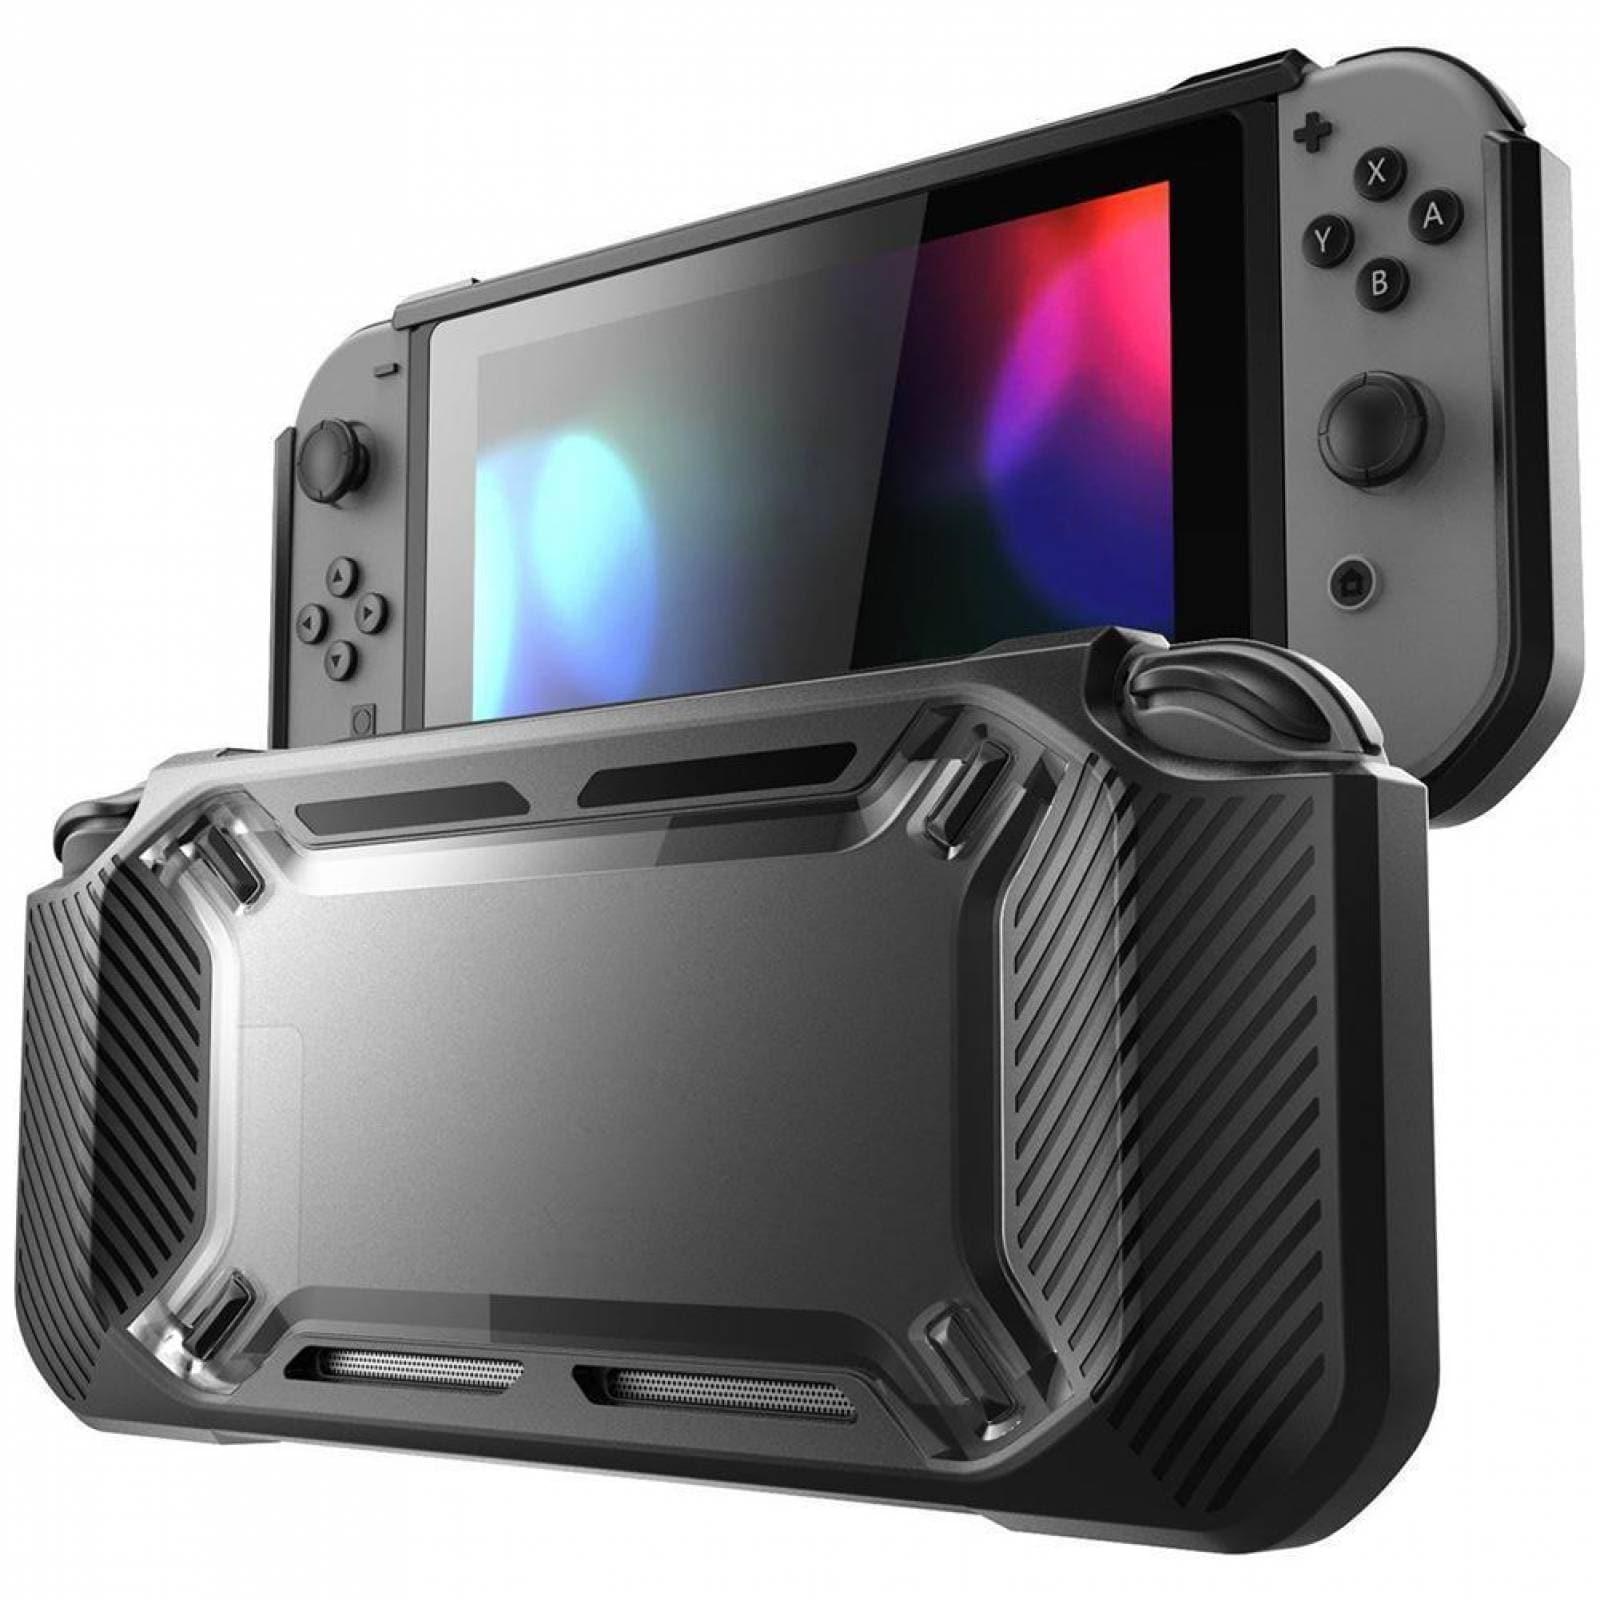 Protector Rigido Negro Nintendo Switch